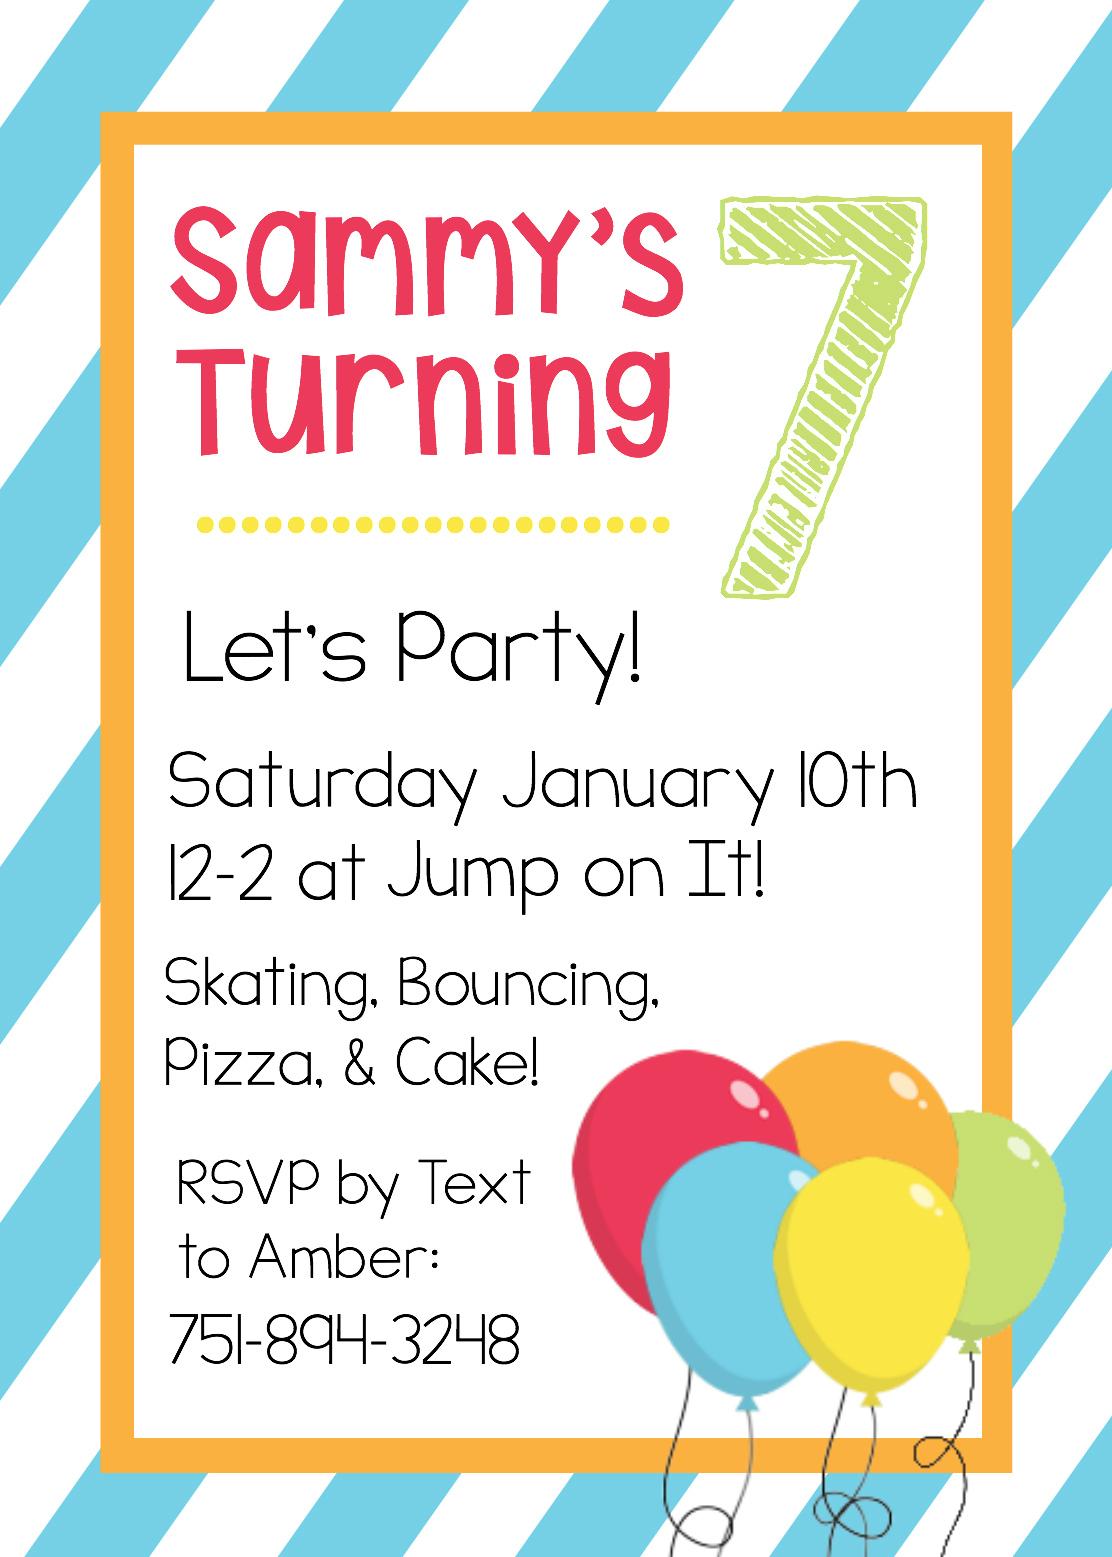 Free Printable Birthday Invitation Templates - Make Your Own Birthday Party Invitations Free Printable